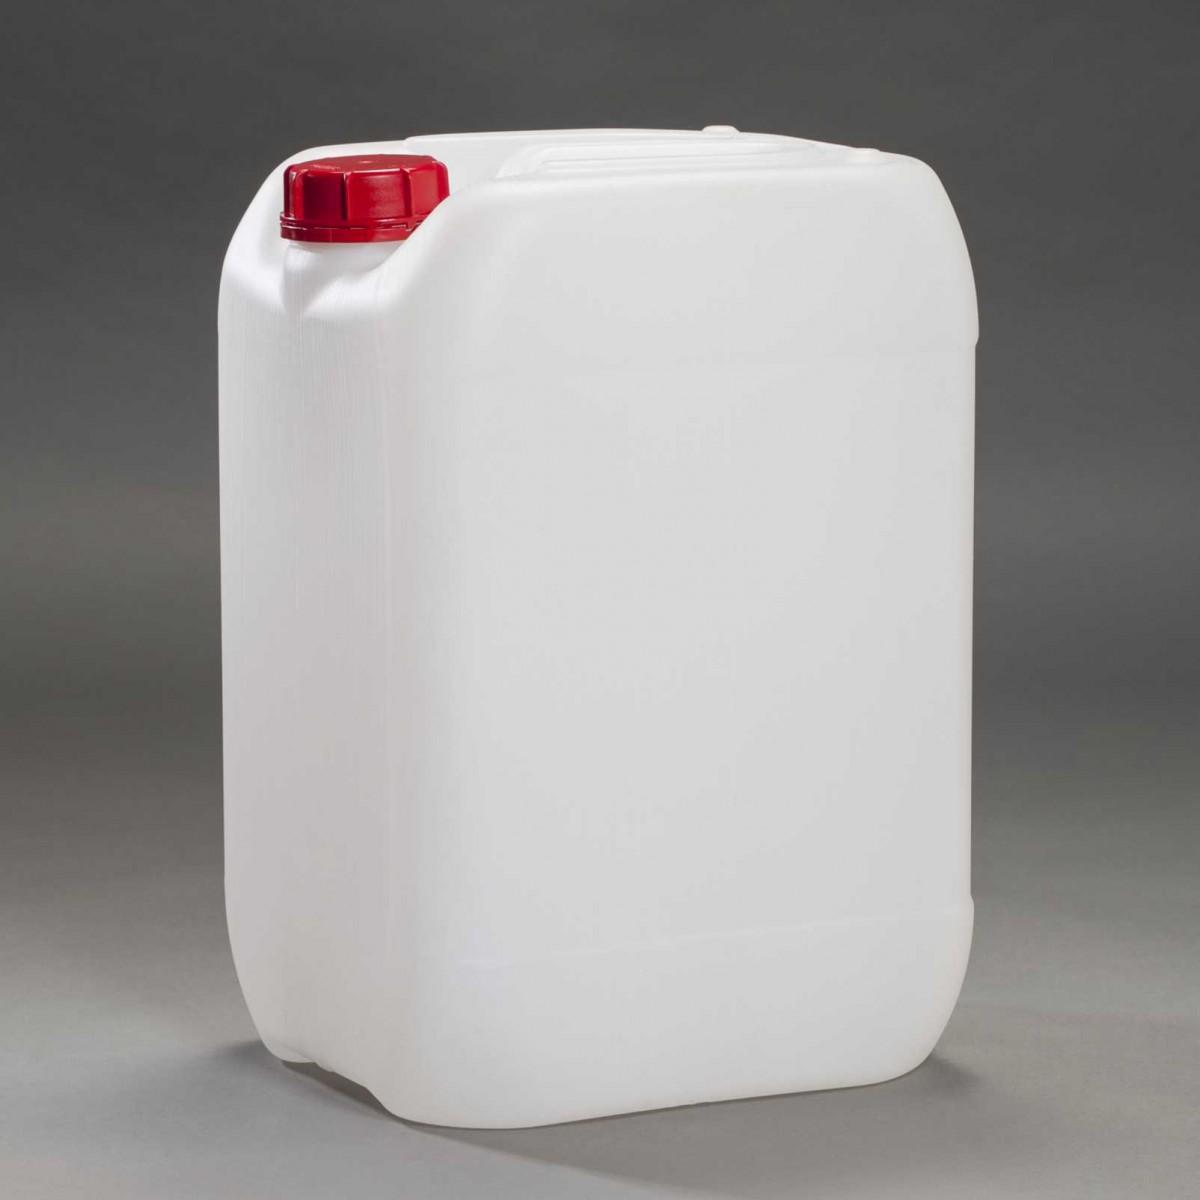 Изопропиловый спирт технический Марка С (ТУ 2421-556-05763441-2016) 10 литров